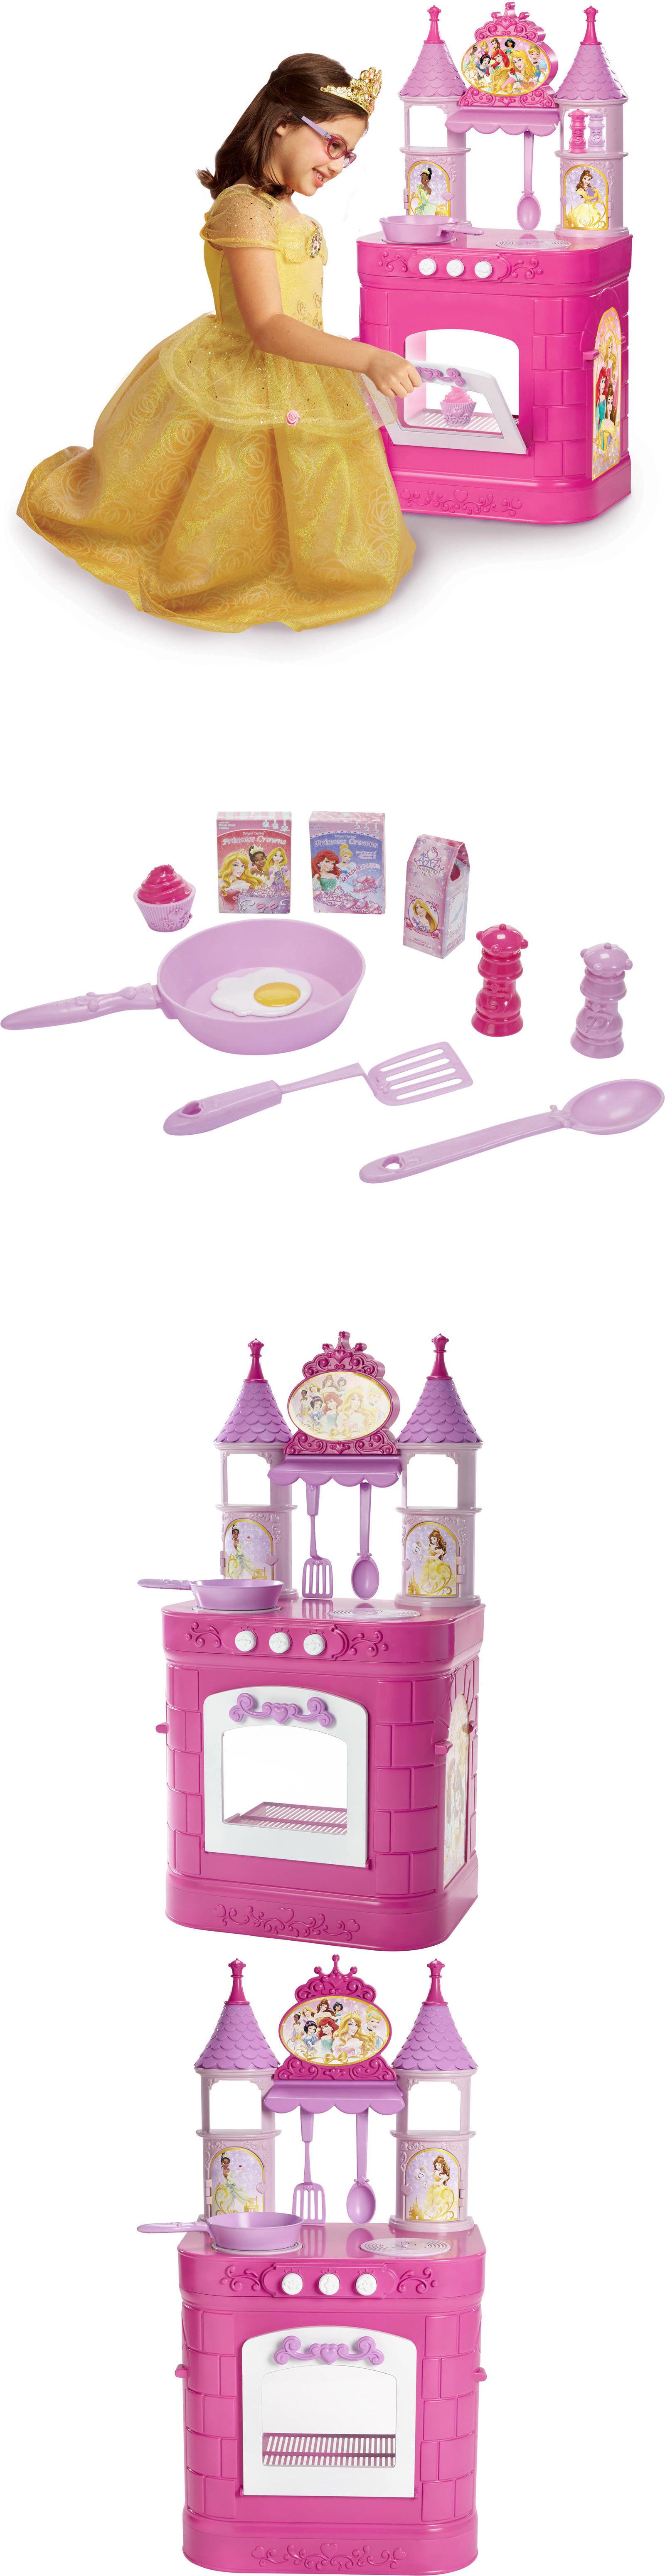 Little Mermaid 44036: Disney Princess Magical Kitchen Kids Girls ...